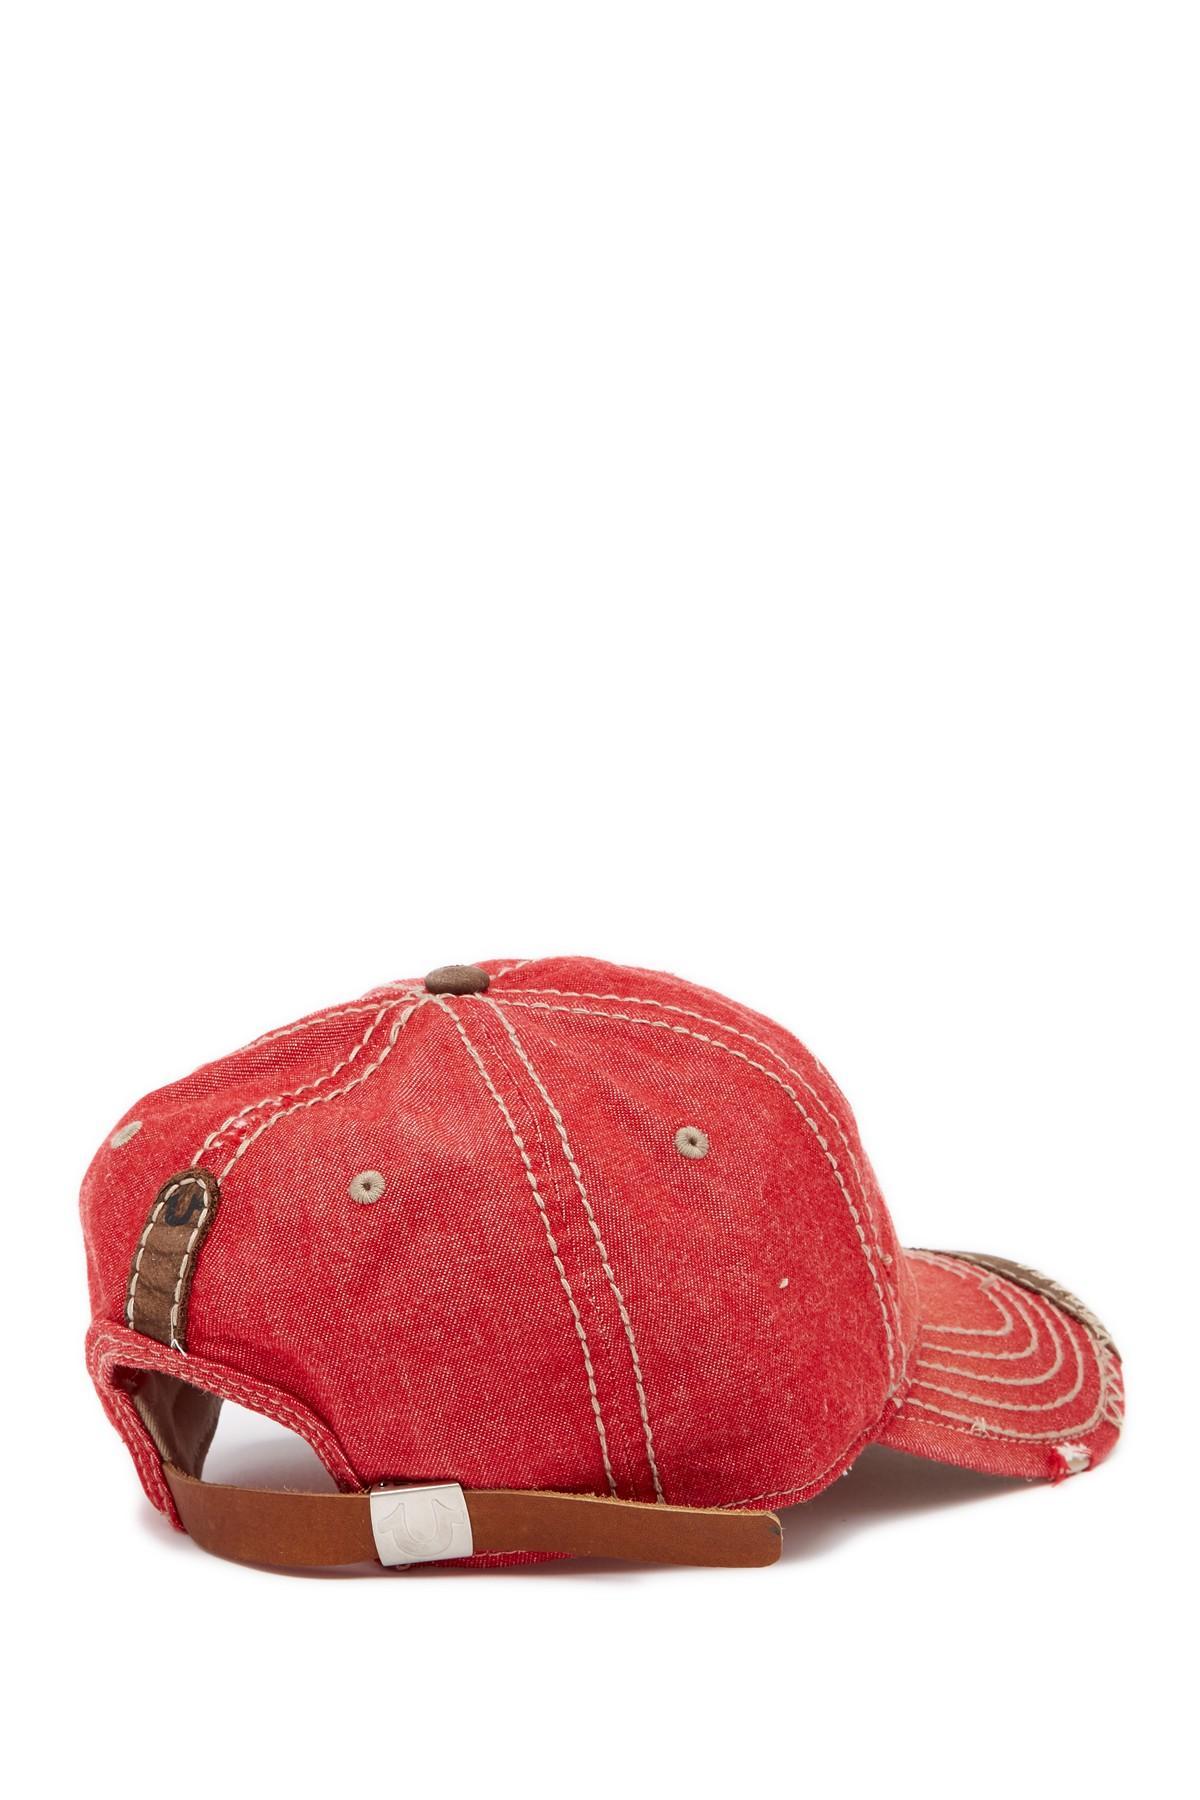 55b51a4a Lyst - True Religion Raised Logo Denim Baseball Cap in Red for Men